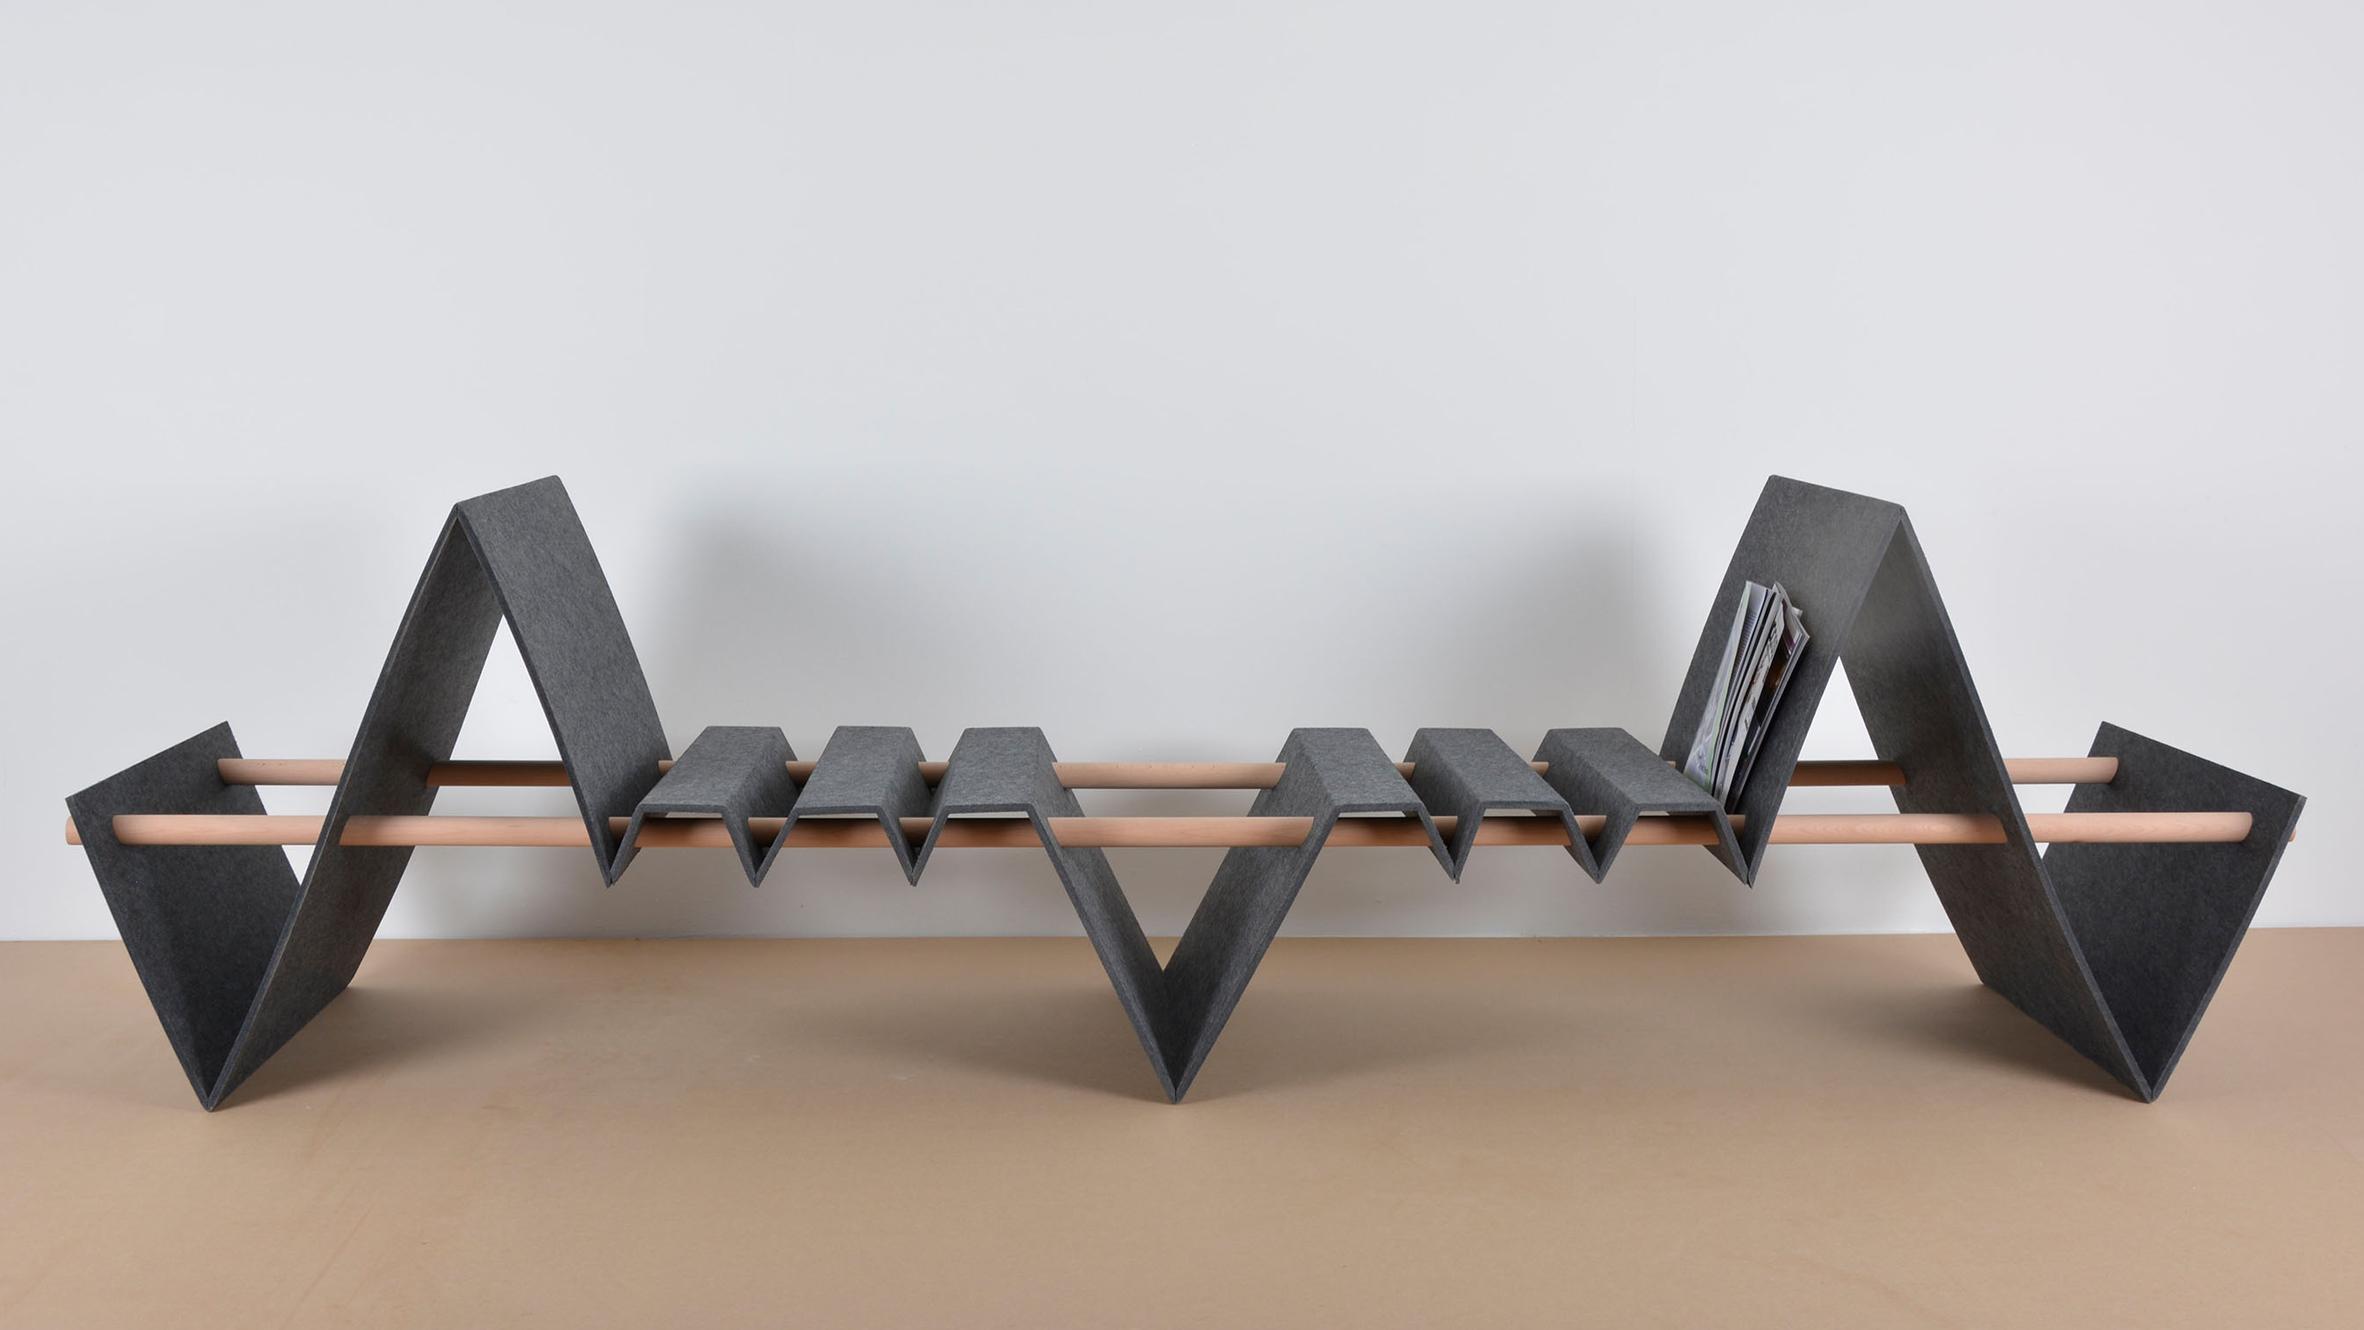 Furniture Design 2017 german students design flexible furniture collection using felt